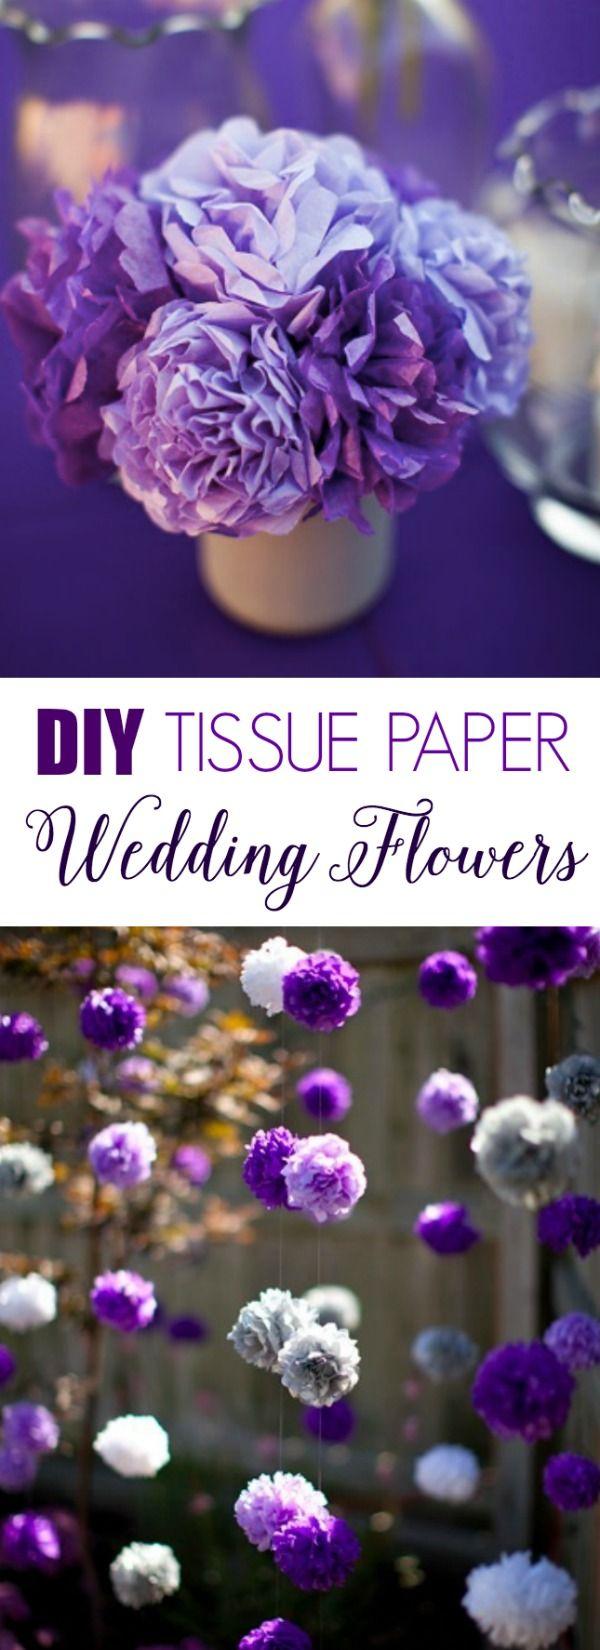 diy tissue paper wedding flowers